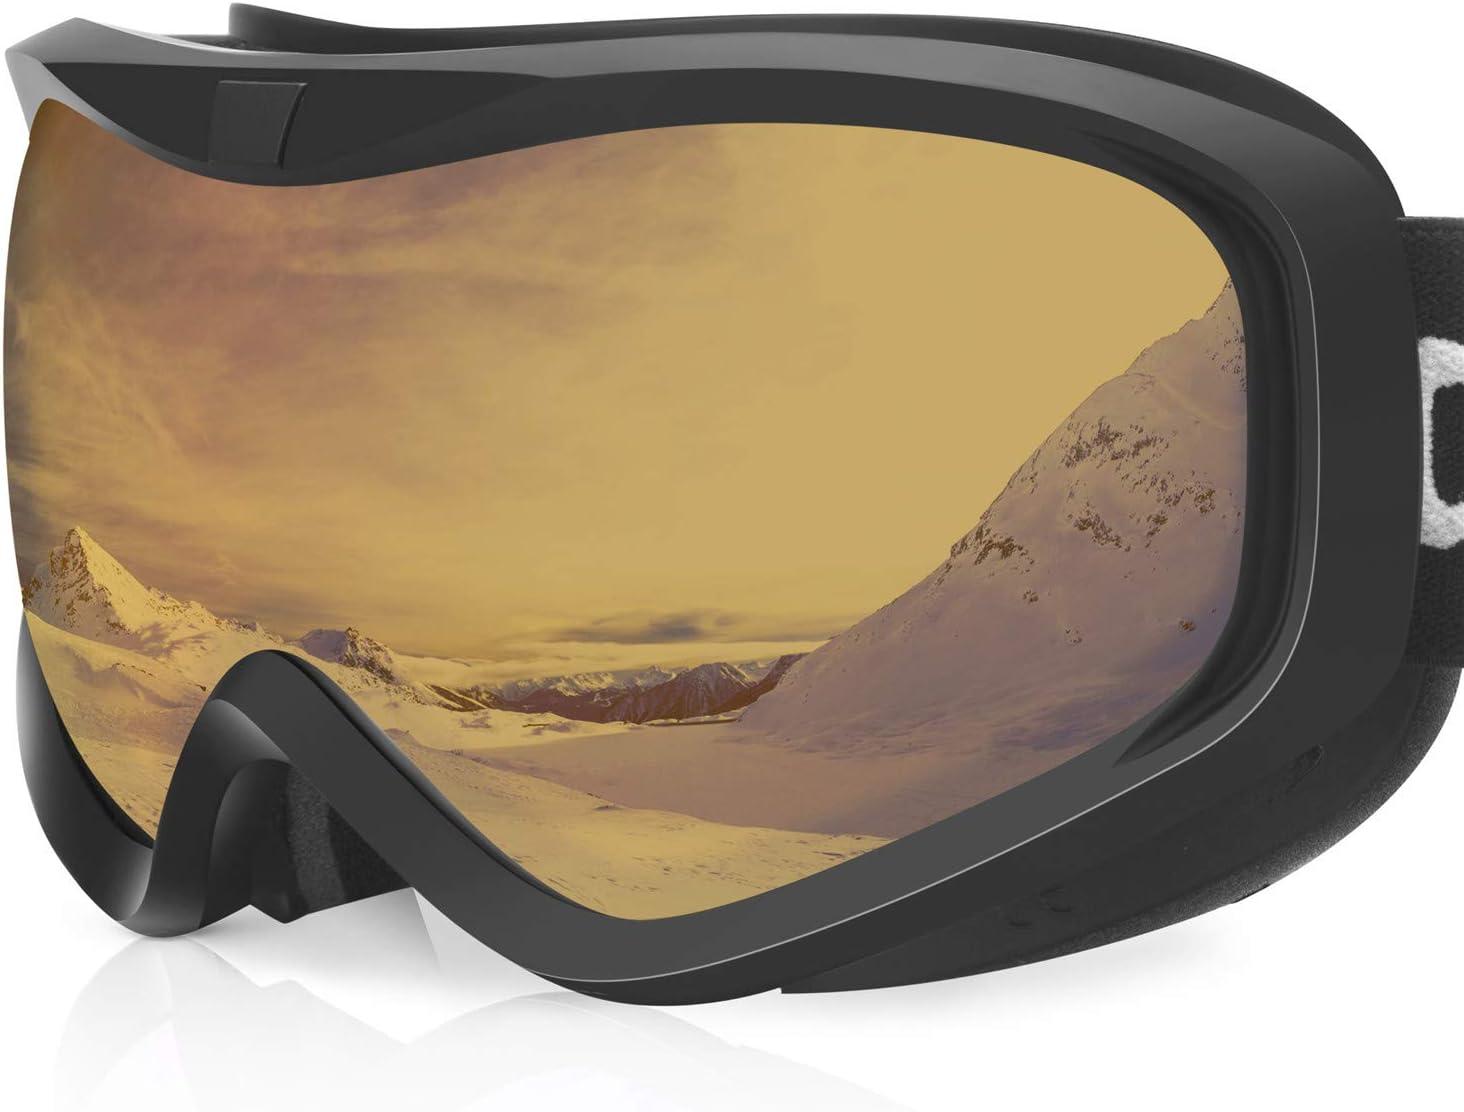 devembr OTG Ski Goggles Clear, Snowboard Goggles Anti-Fog, 100 UV Protection, Anti-Slip Strap, Helmet Compatible Snow Goggles for Men Women, Skiing Snowmobile Skating Black White Frame